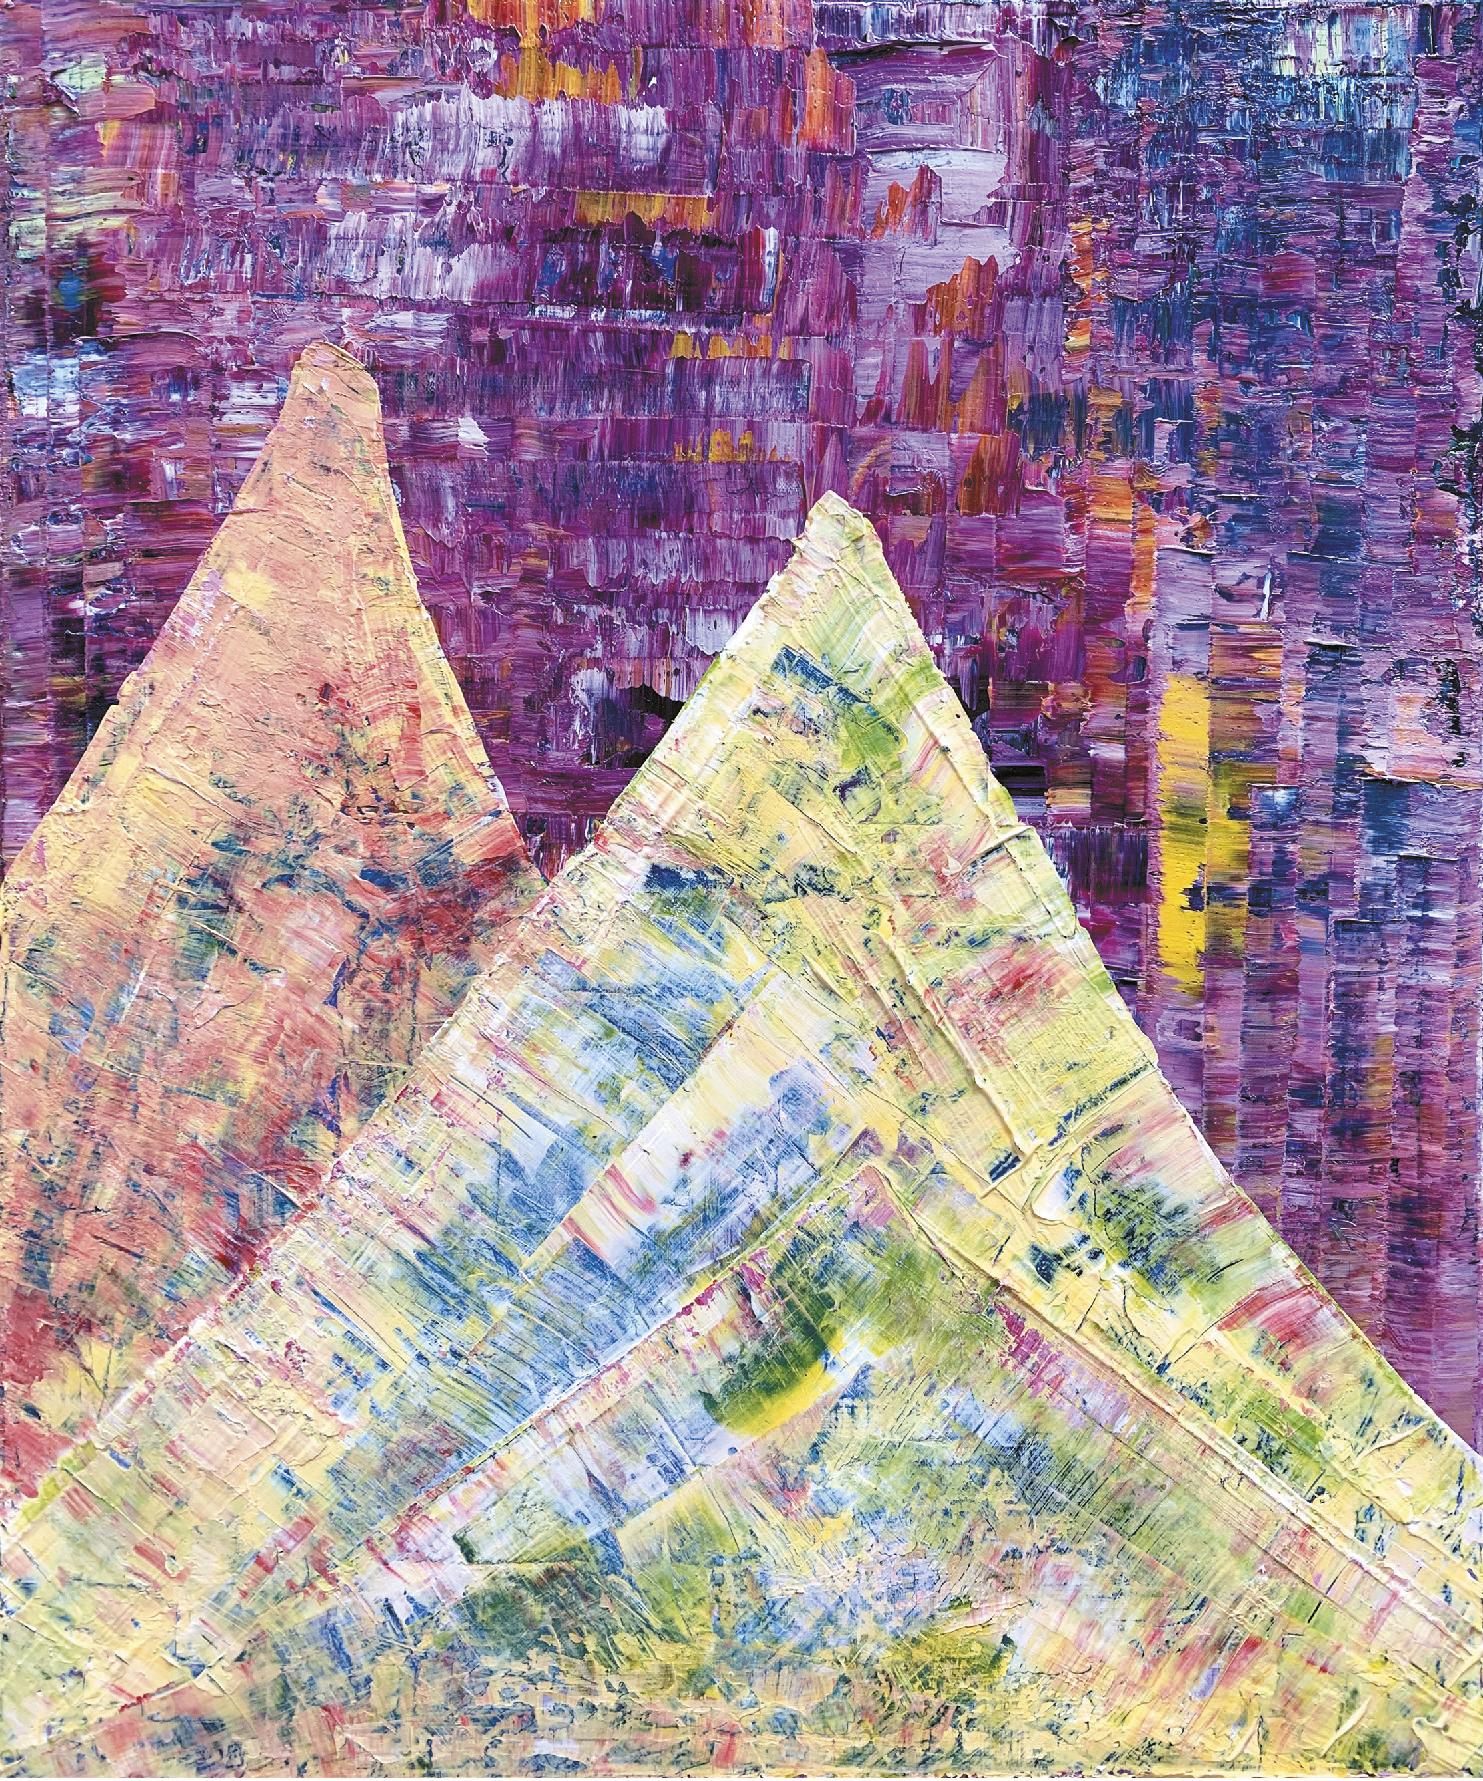 Behnam-Bakhtiar Sassan (1984) Mountains of Life, 2018 - 64 x 55 cm - Oil and acrylic [...]